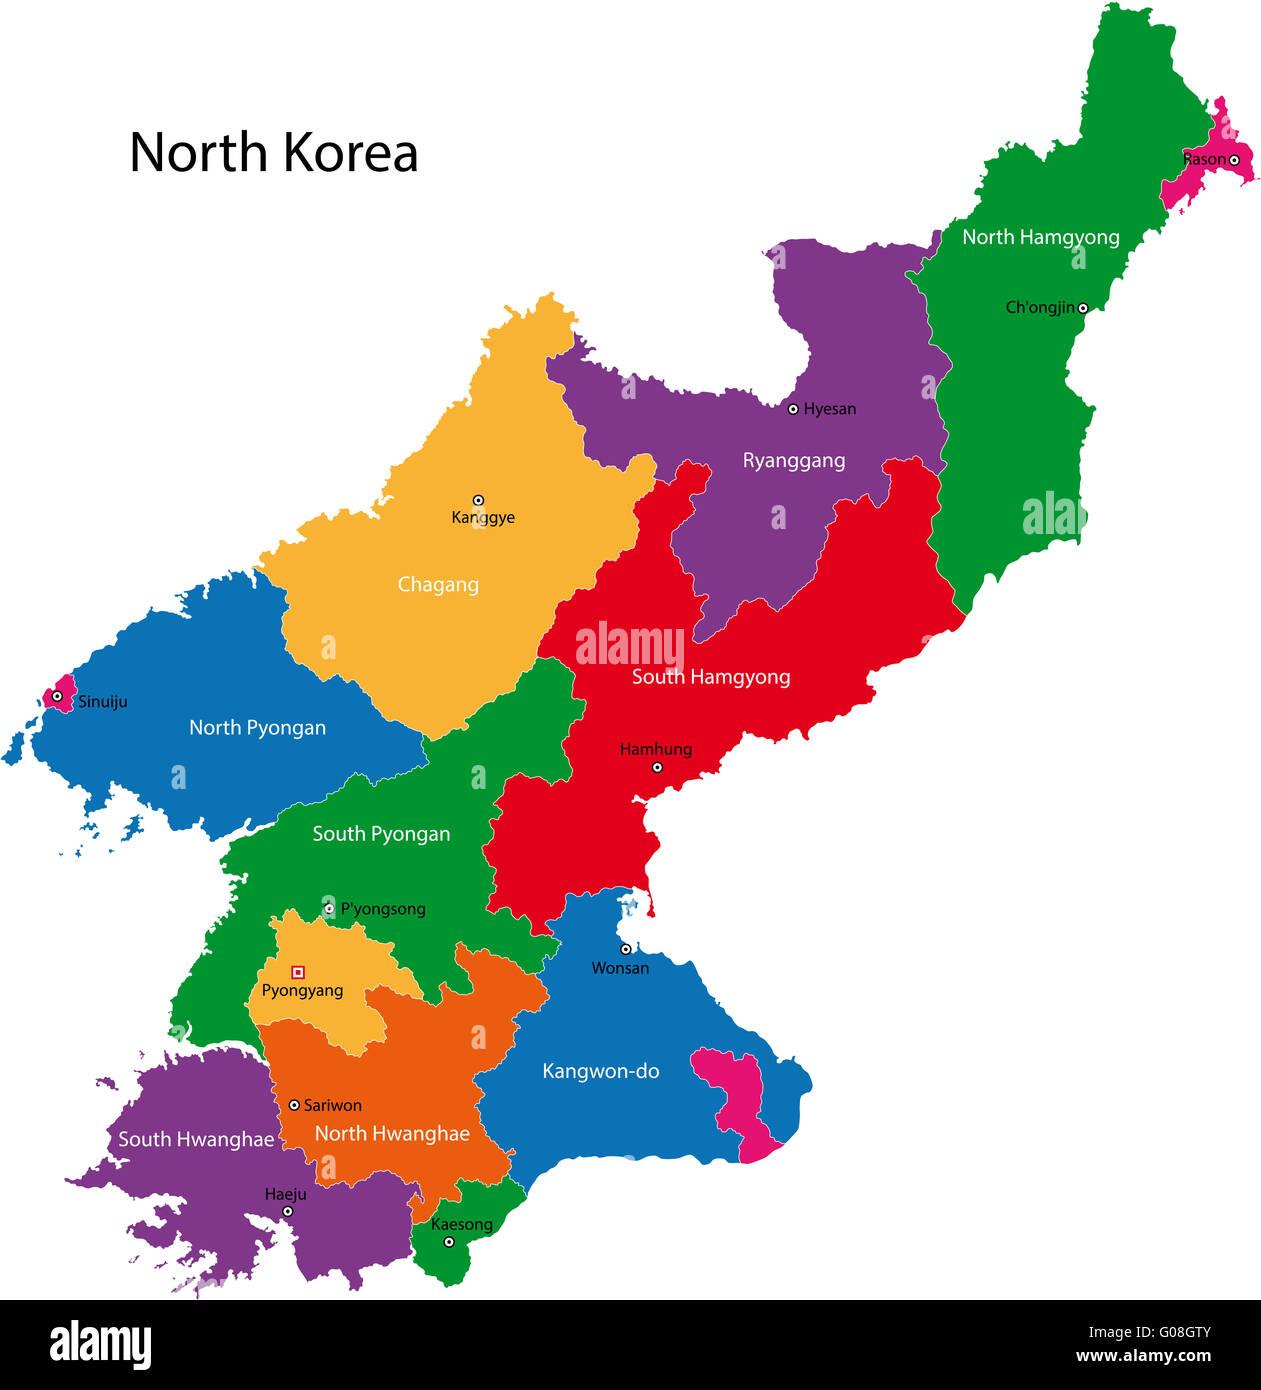 North Korea Map Stock Photos & North Korea Map Stock Images - Alamy